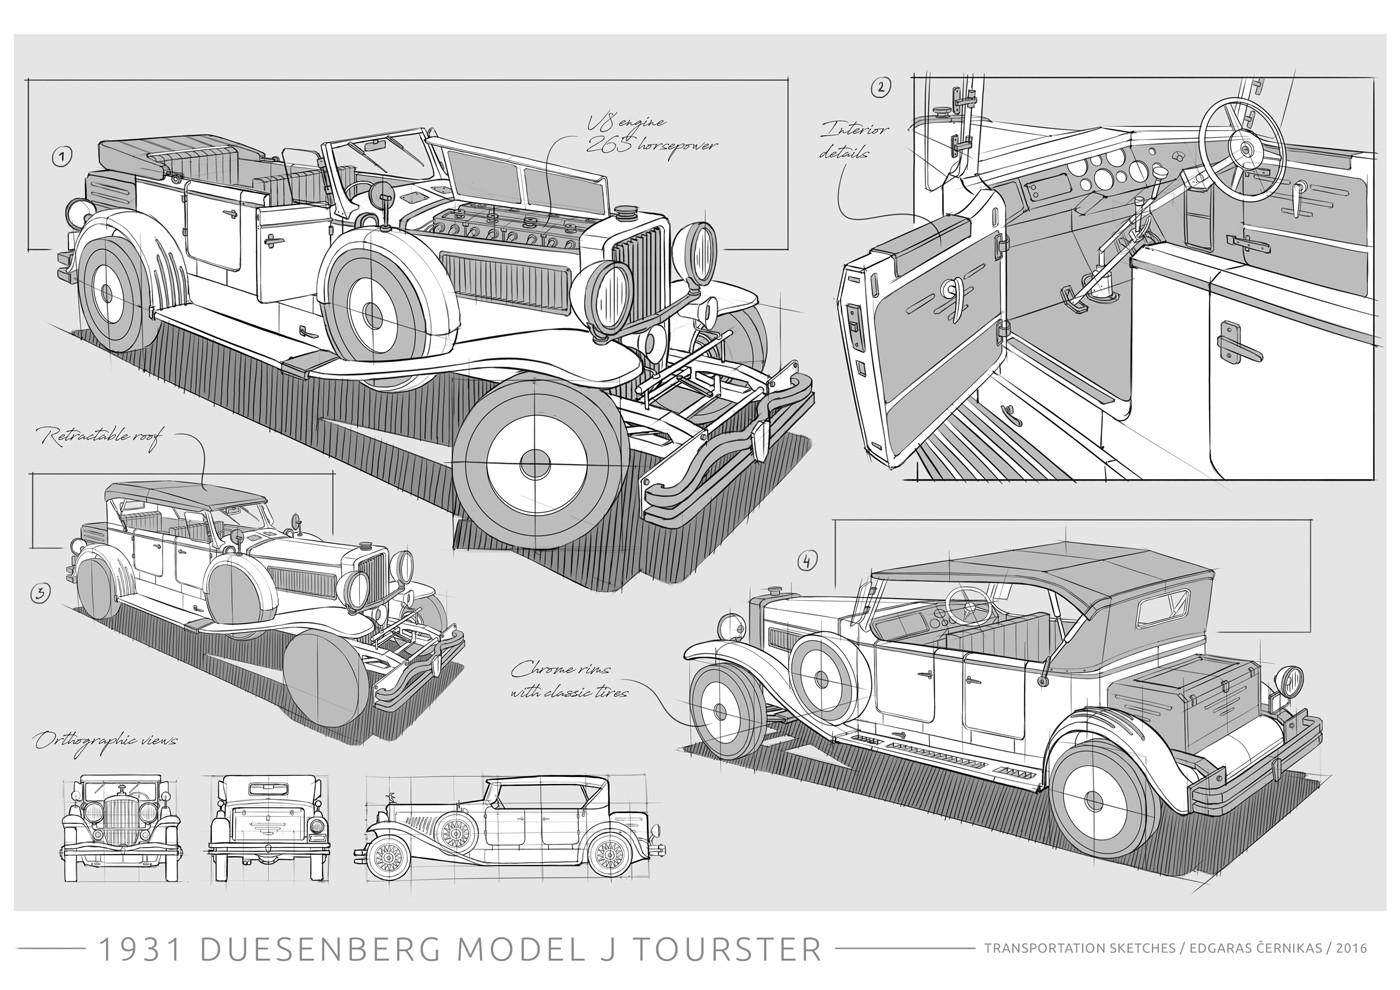 Edgaras cernikas transportation sketches duesenberg j derham tourster 1400x990